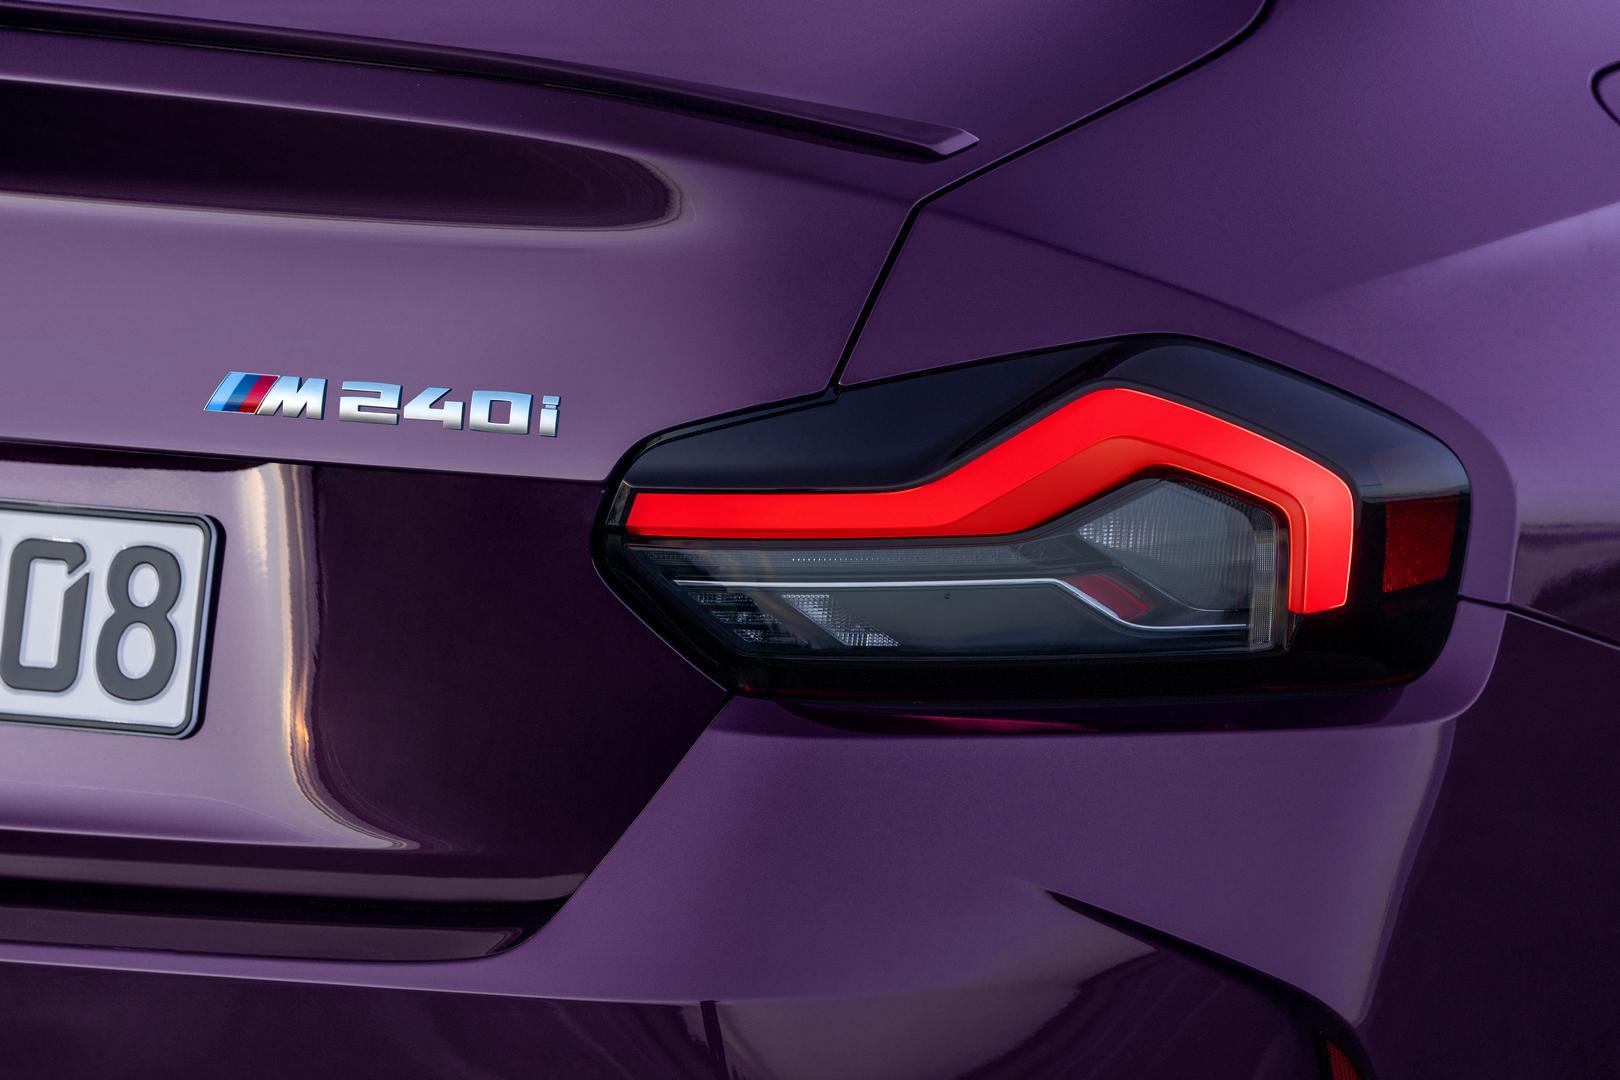 2022 BMW M240i taillights